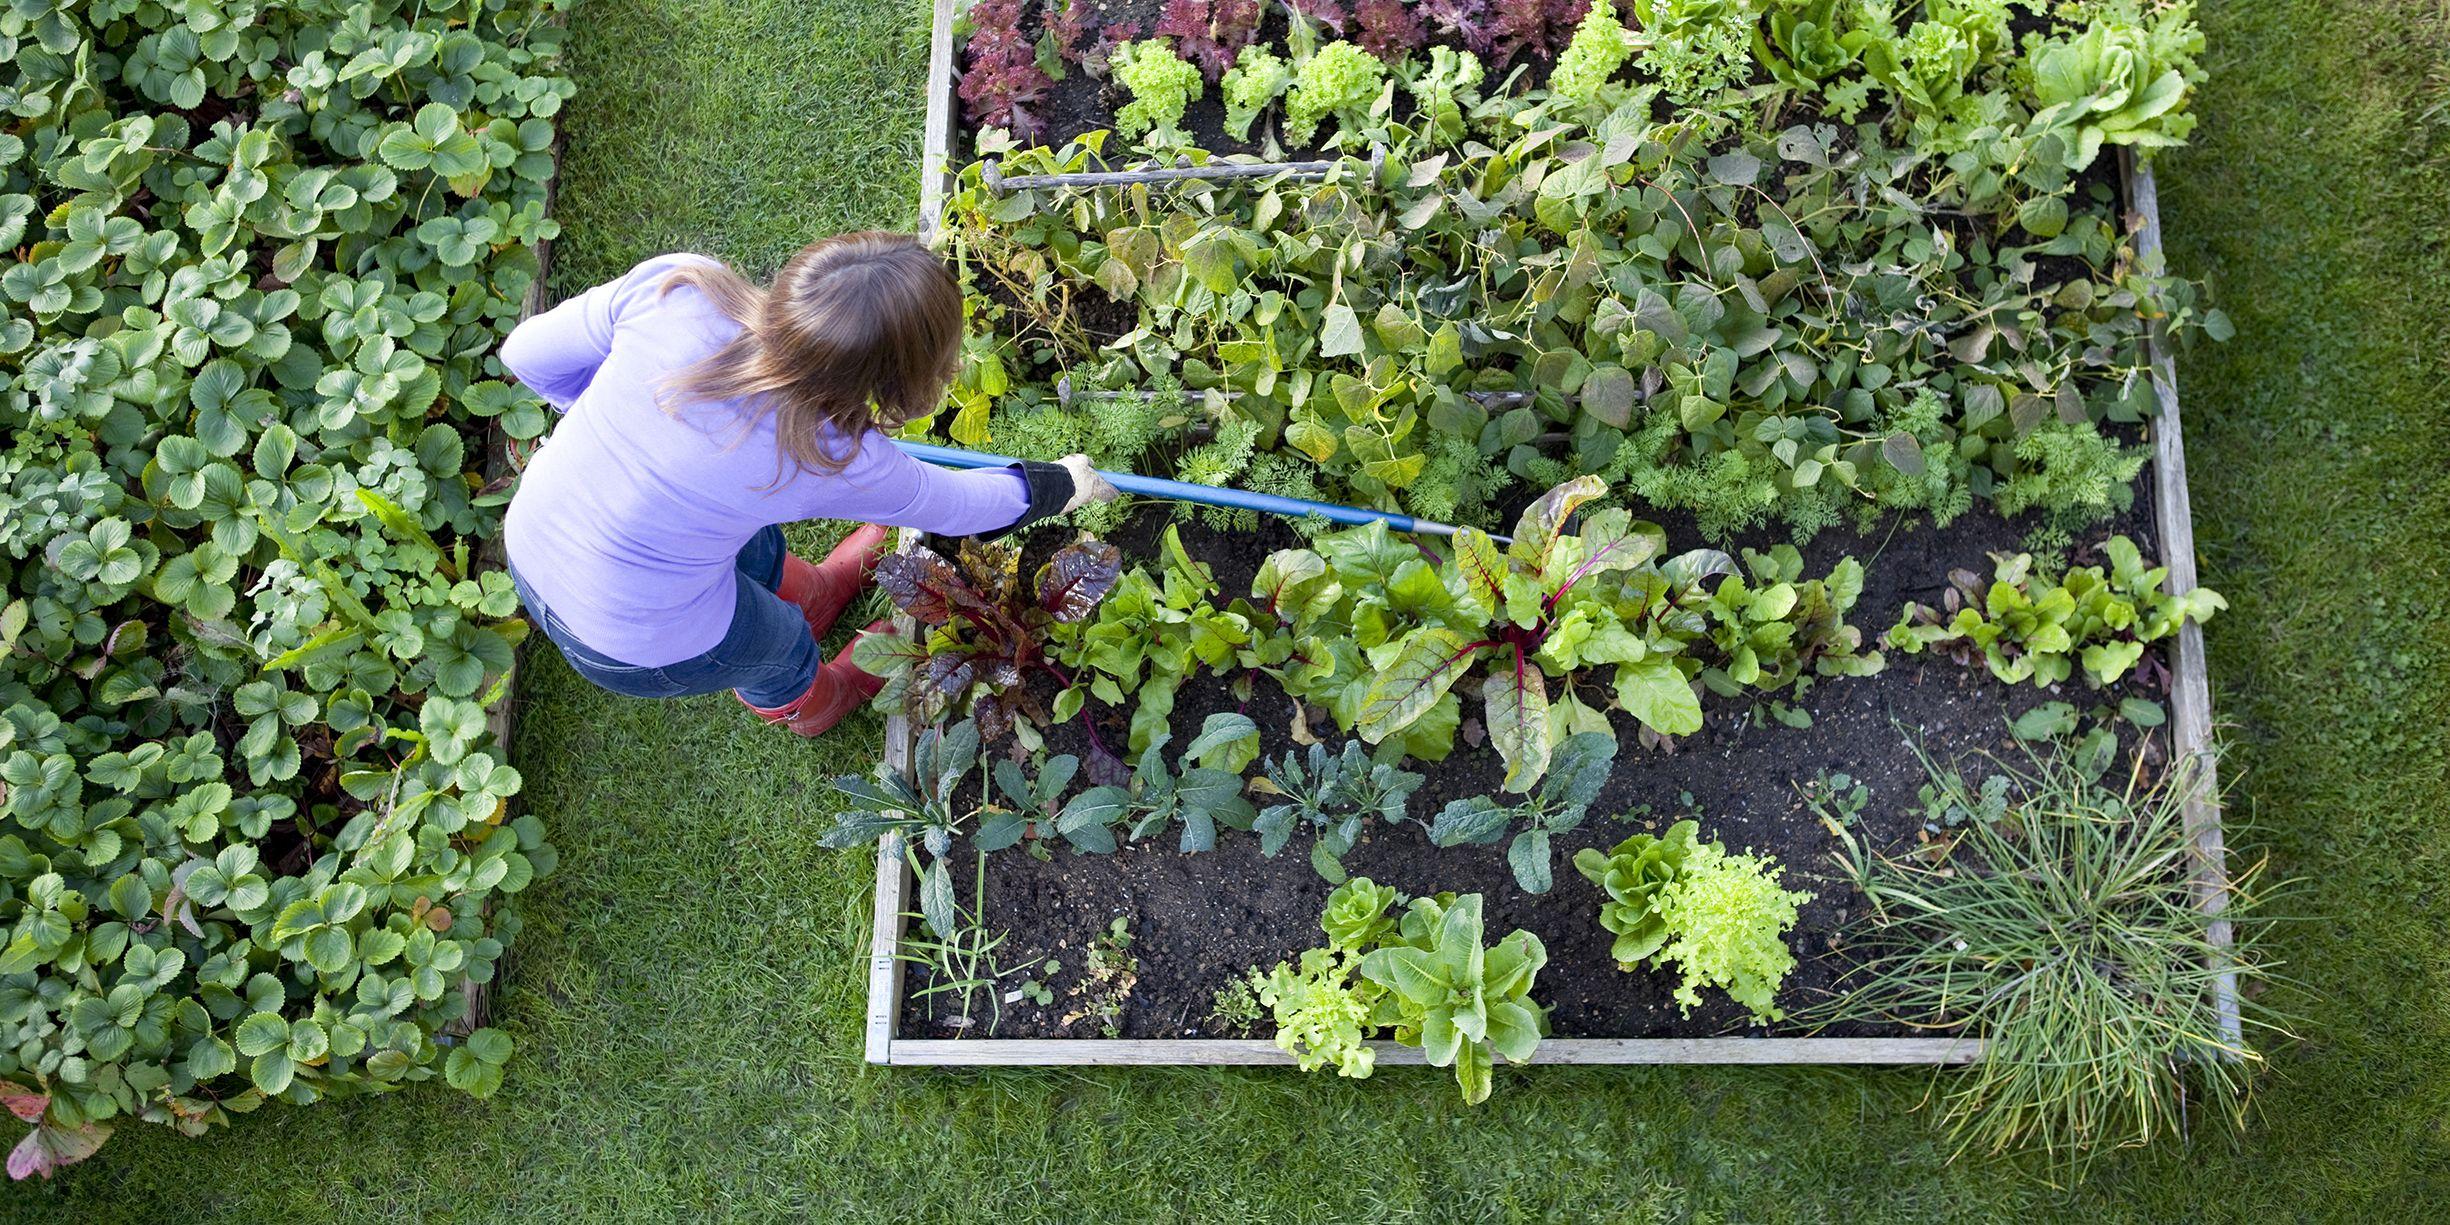 gardens small preen lb grass family a ways organic preventer vegetable control for all toxic footprint weed granular beds garden to non killer weeds